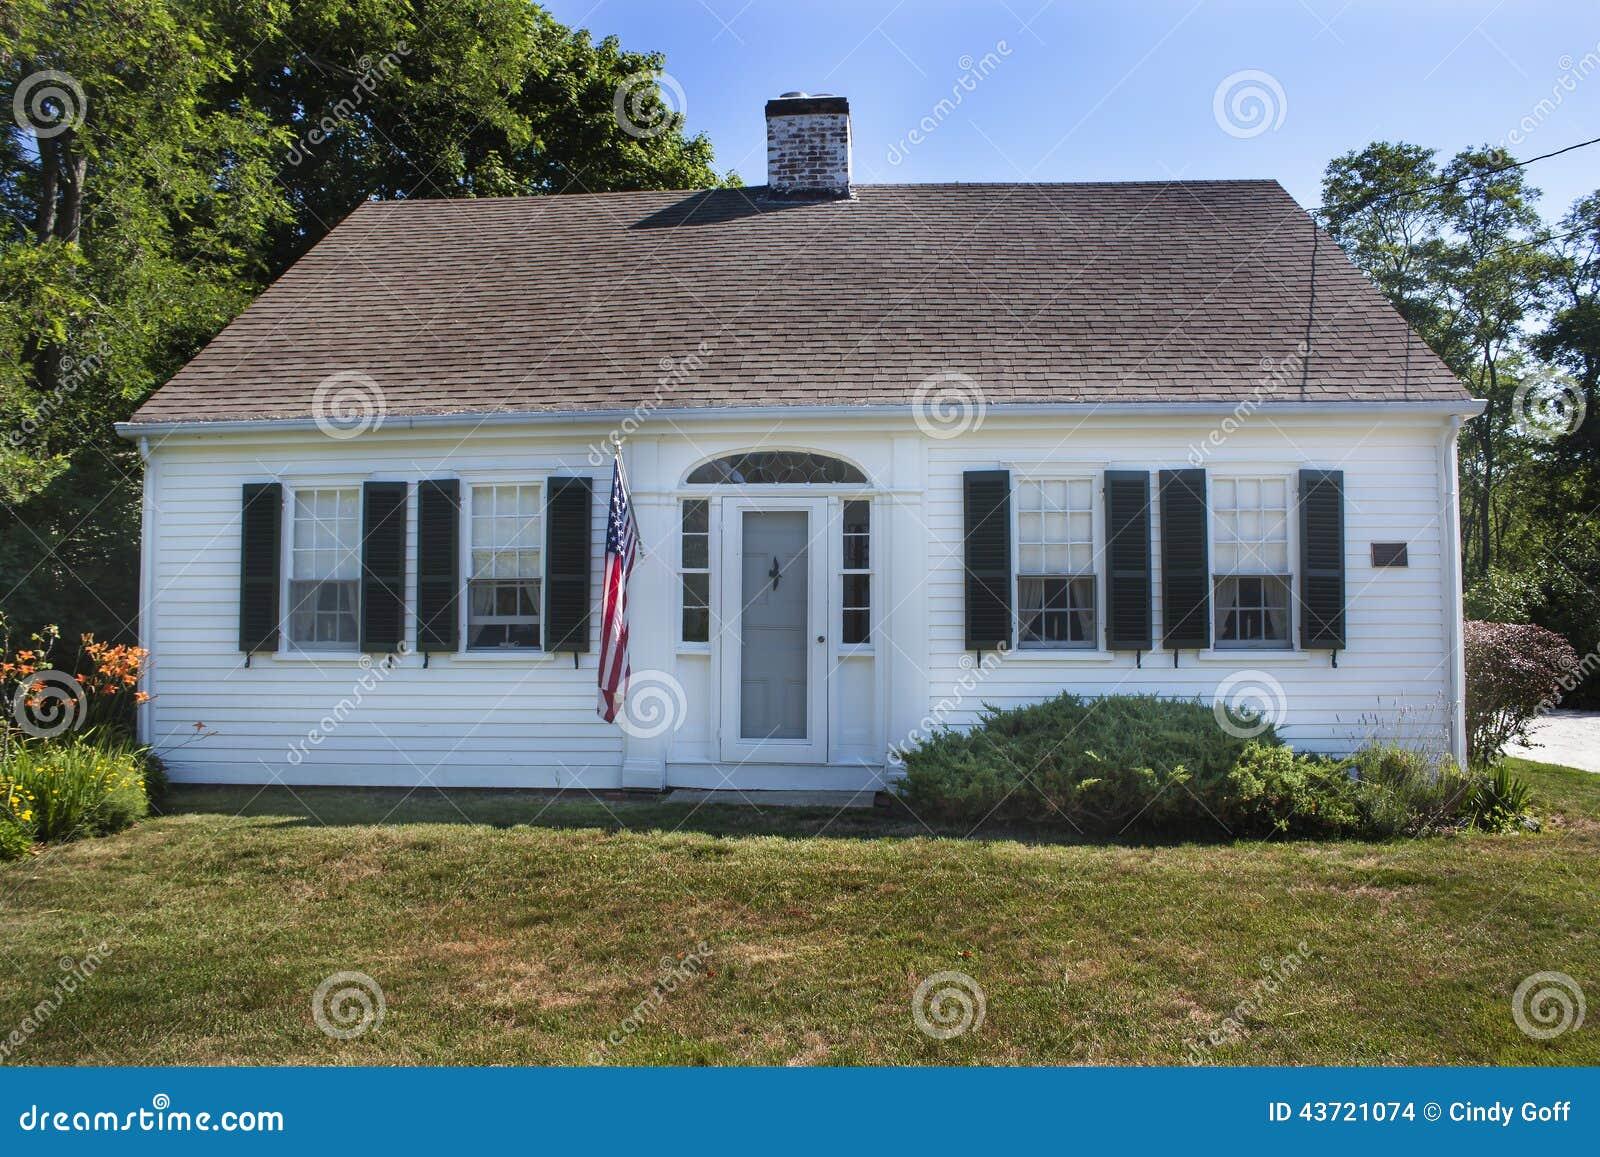 Cape Cod House Stock Photo Image 43721074